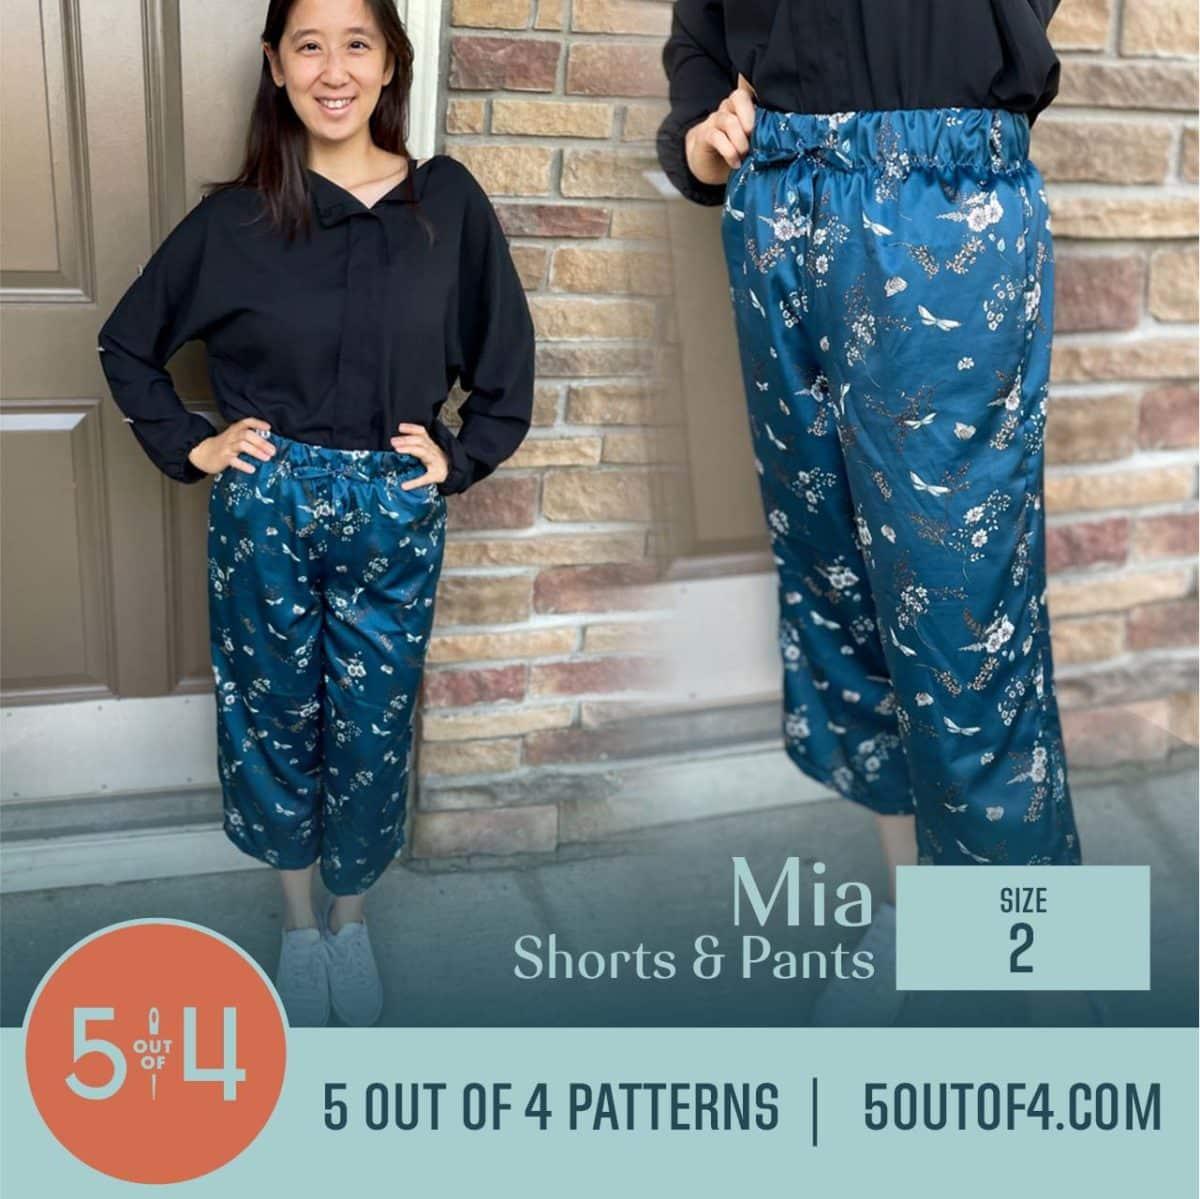 5oo4 Patterns Mia Pants size 2